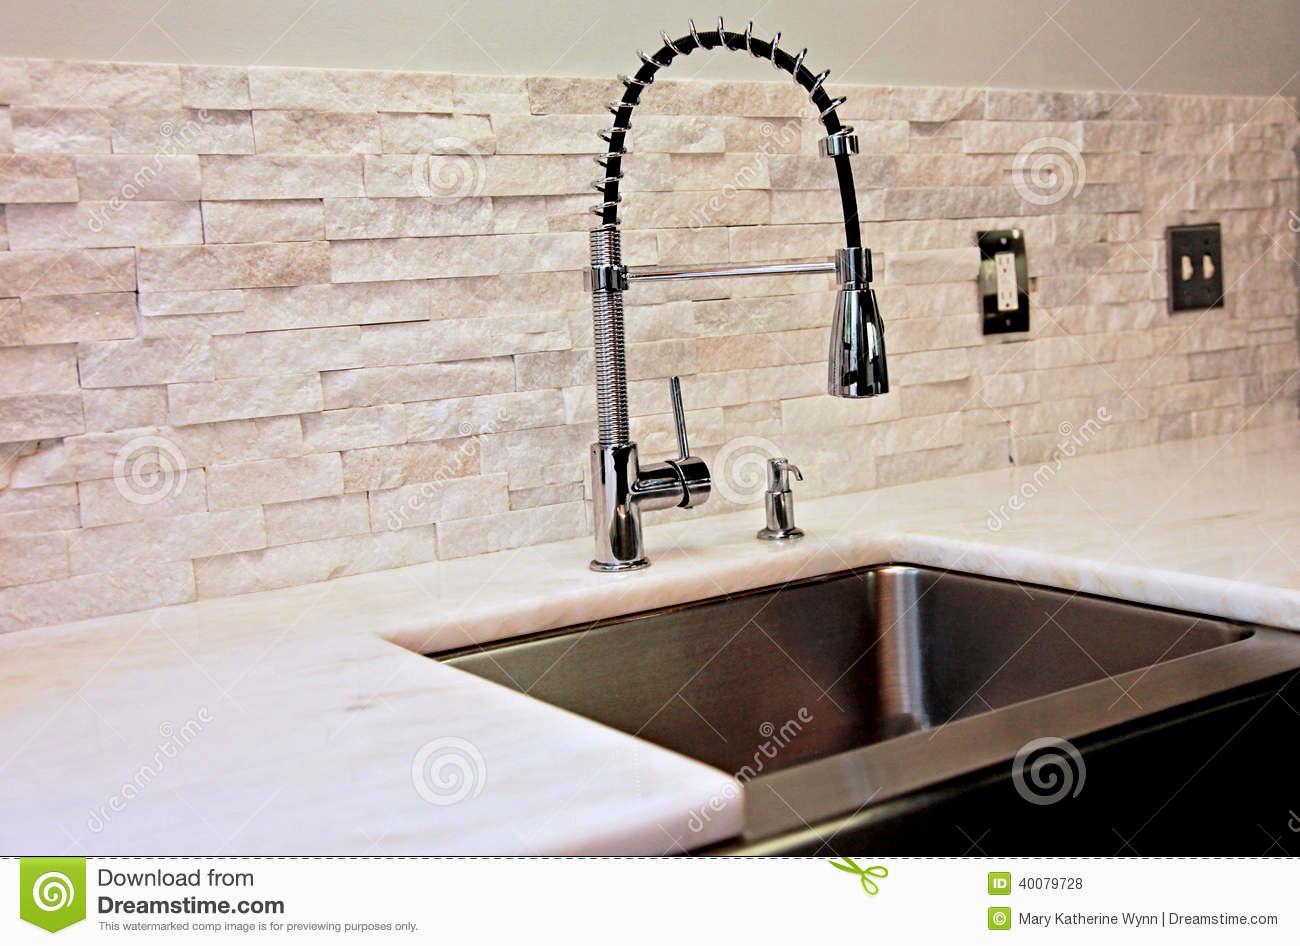 stunning copper bathroom sinks architecture-Fresh Copper Bathroom Sinks Wallpaper